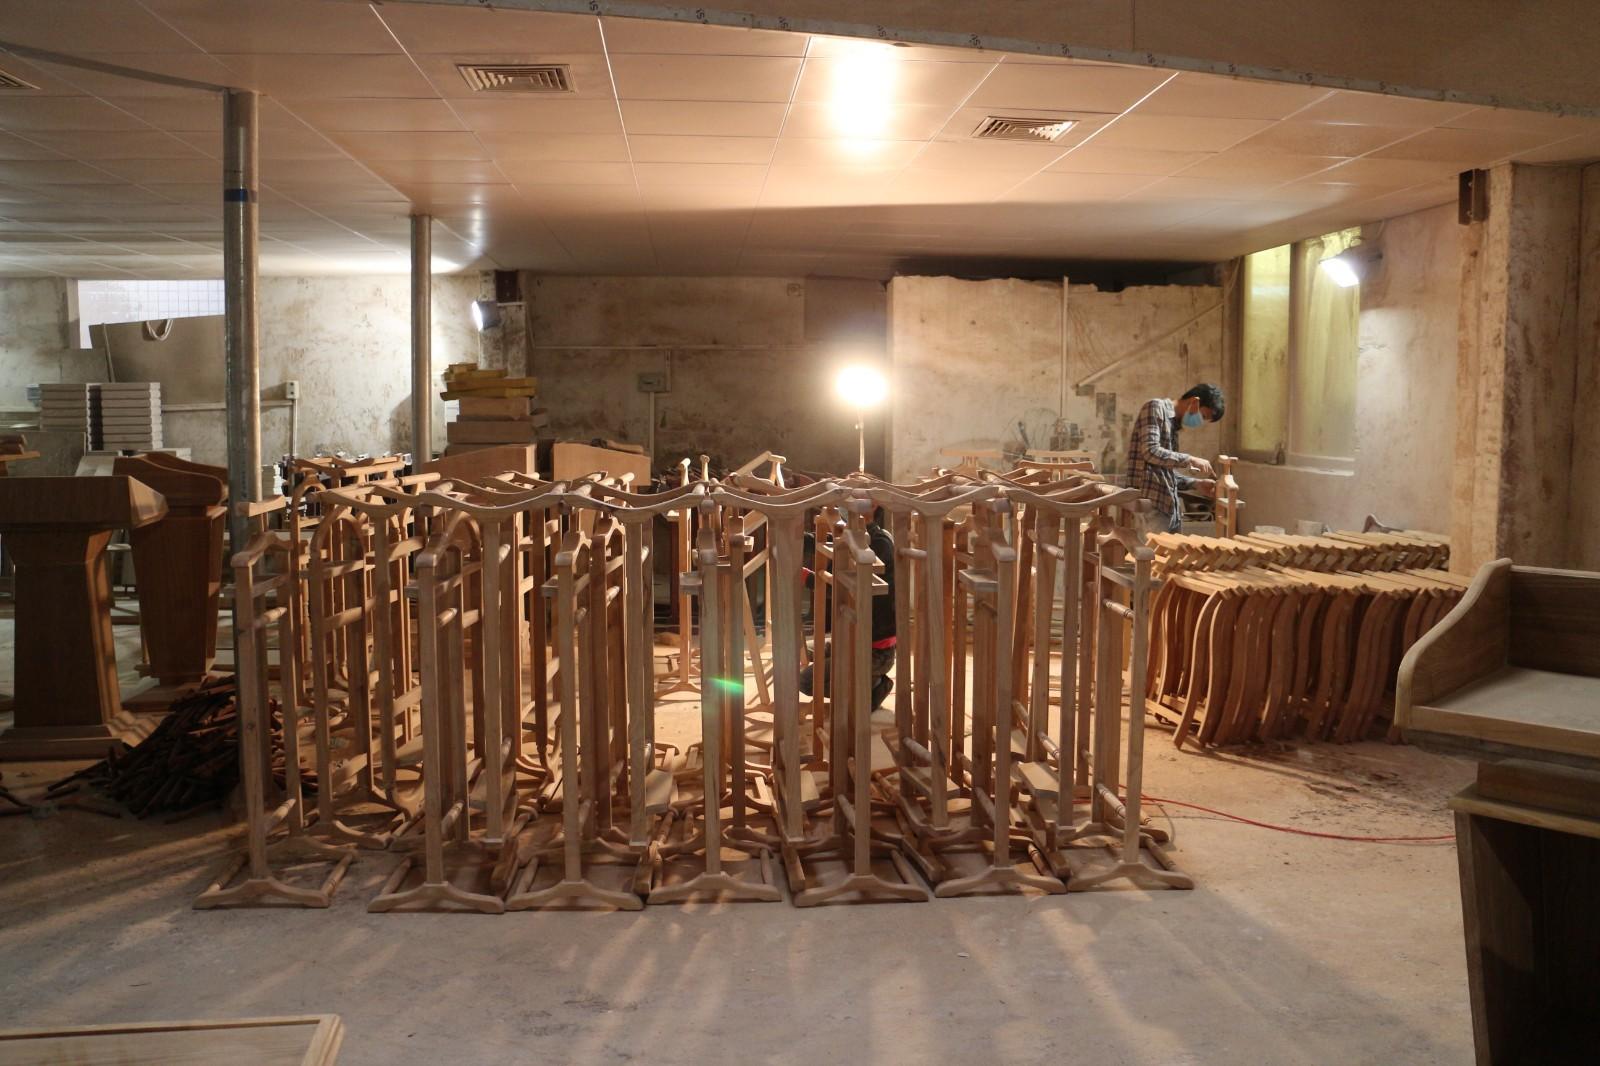 Fenghe-Wholesale Hotel Room Trash Cans Manufacturer, Leather Storage Bin | Fenghe-4